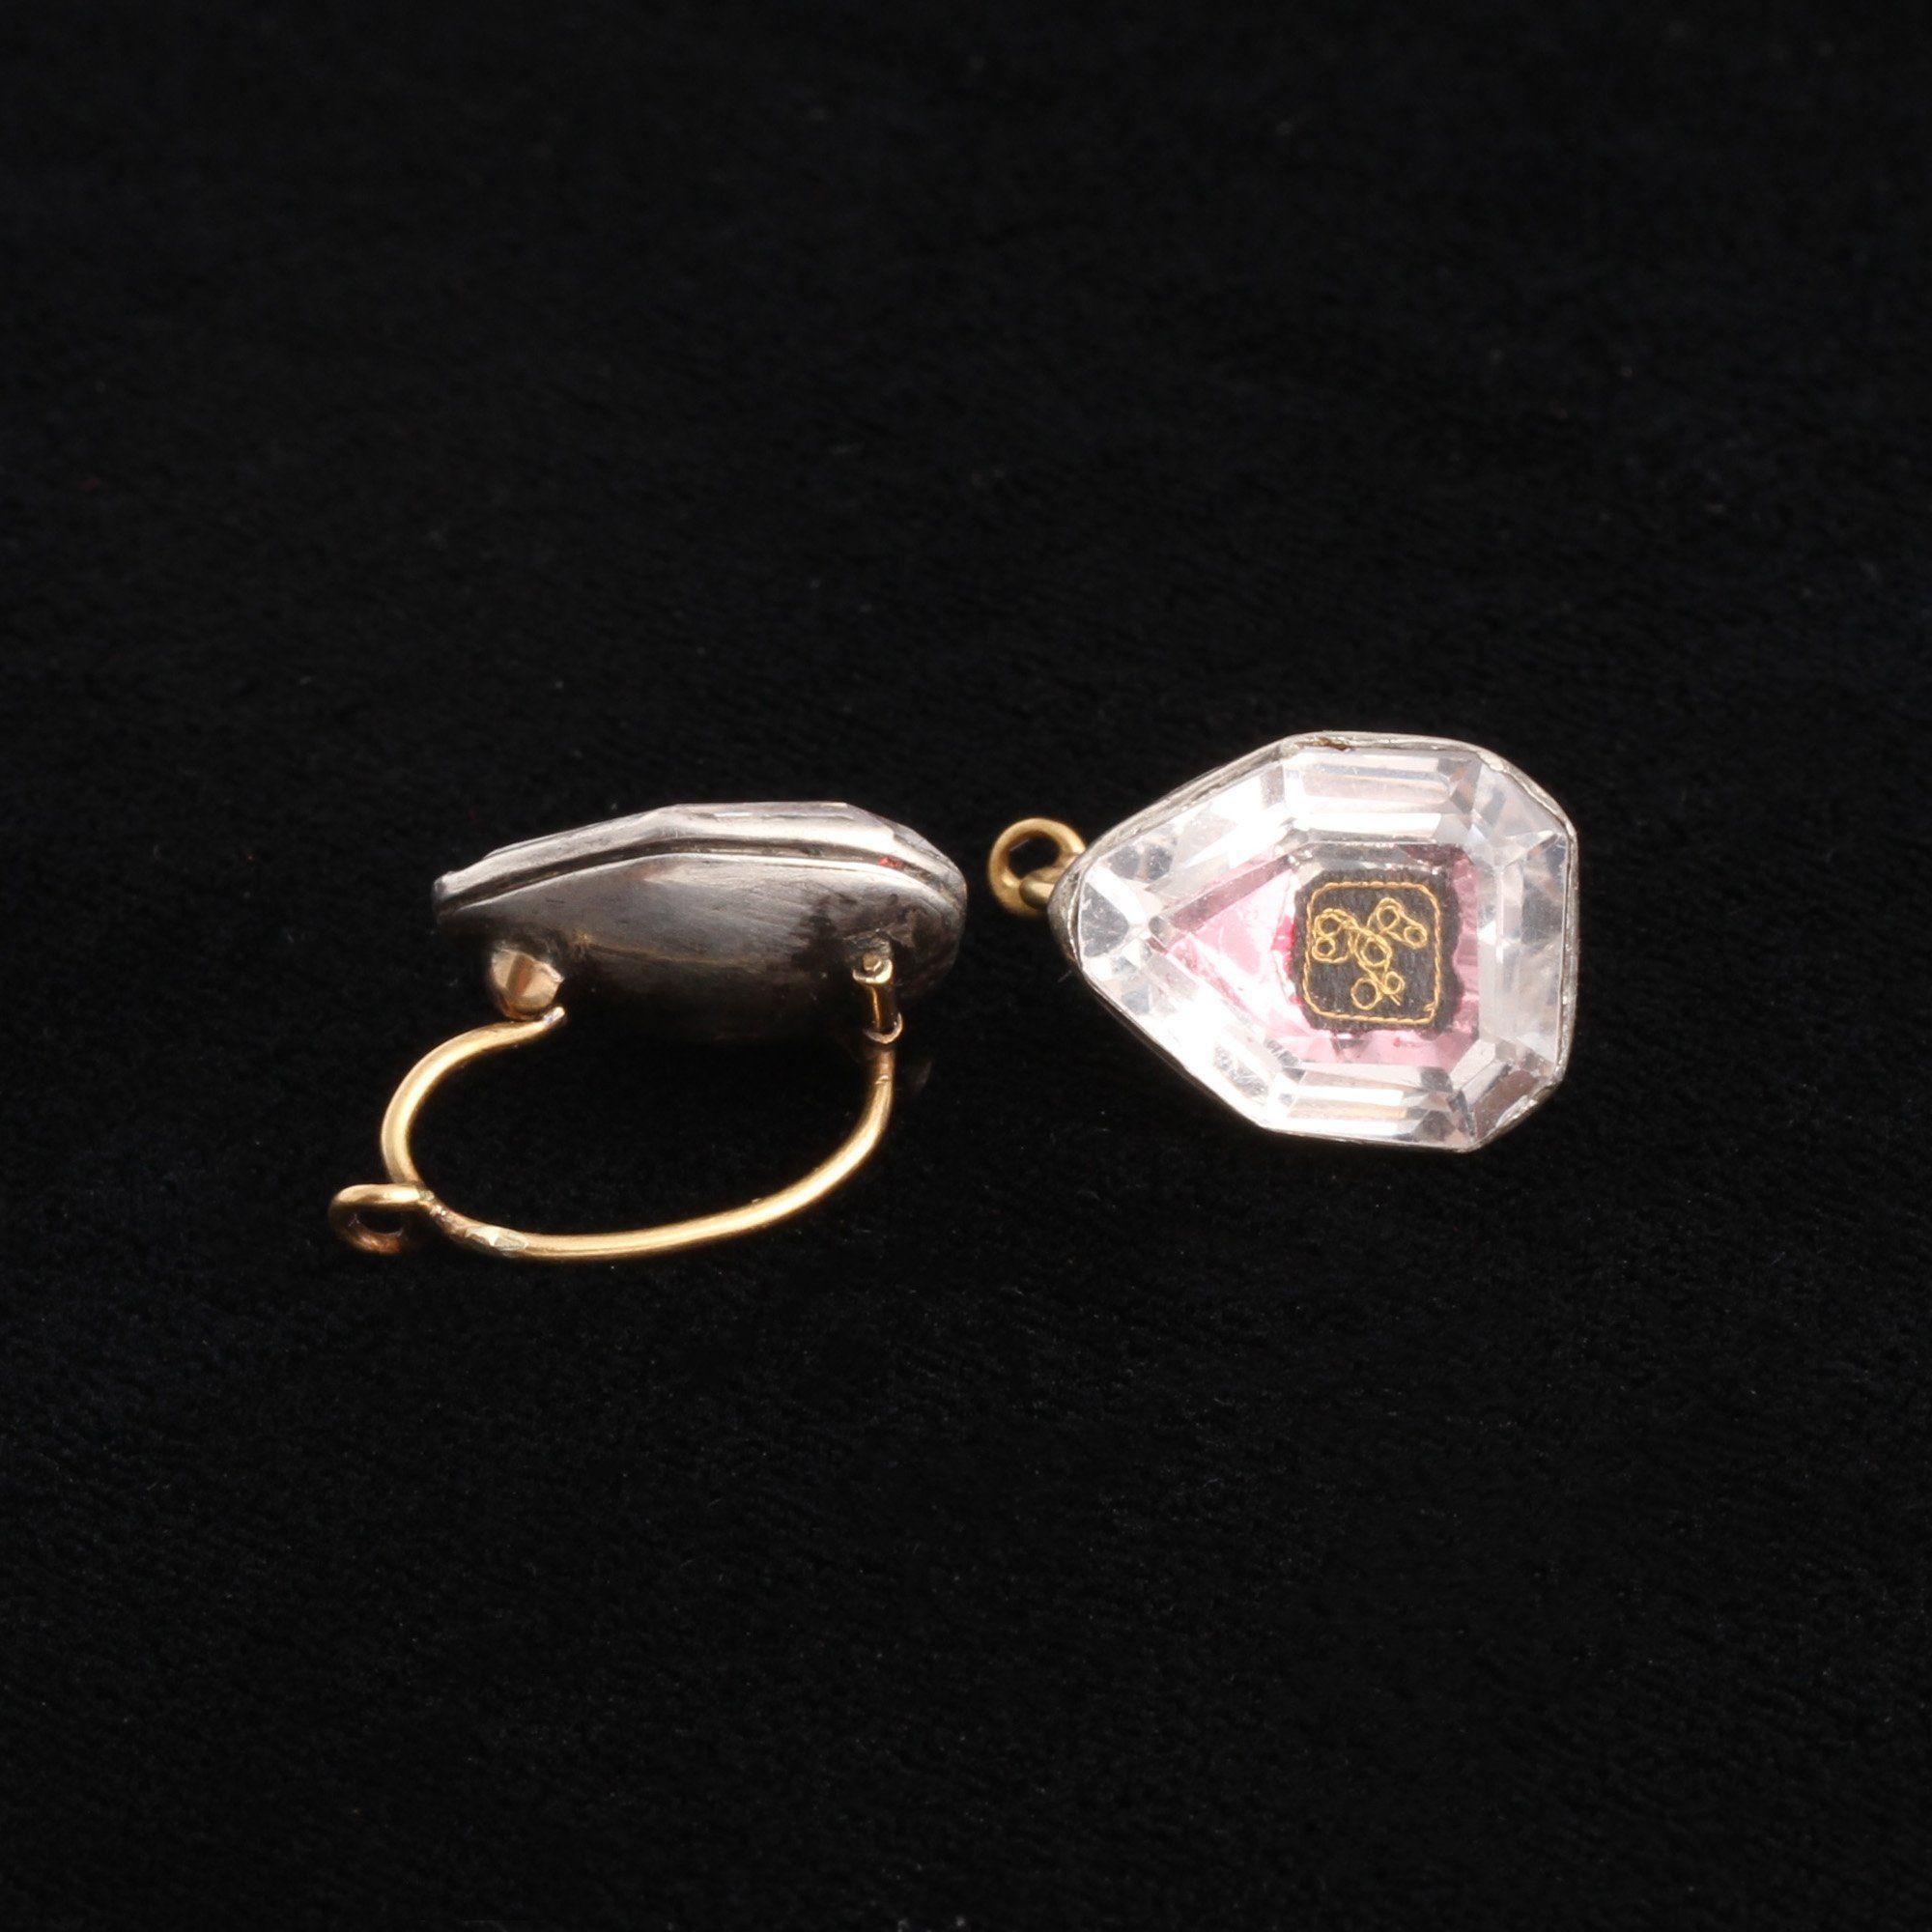 Stuart Crystal Septagon Earrings